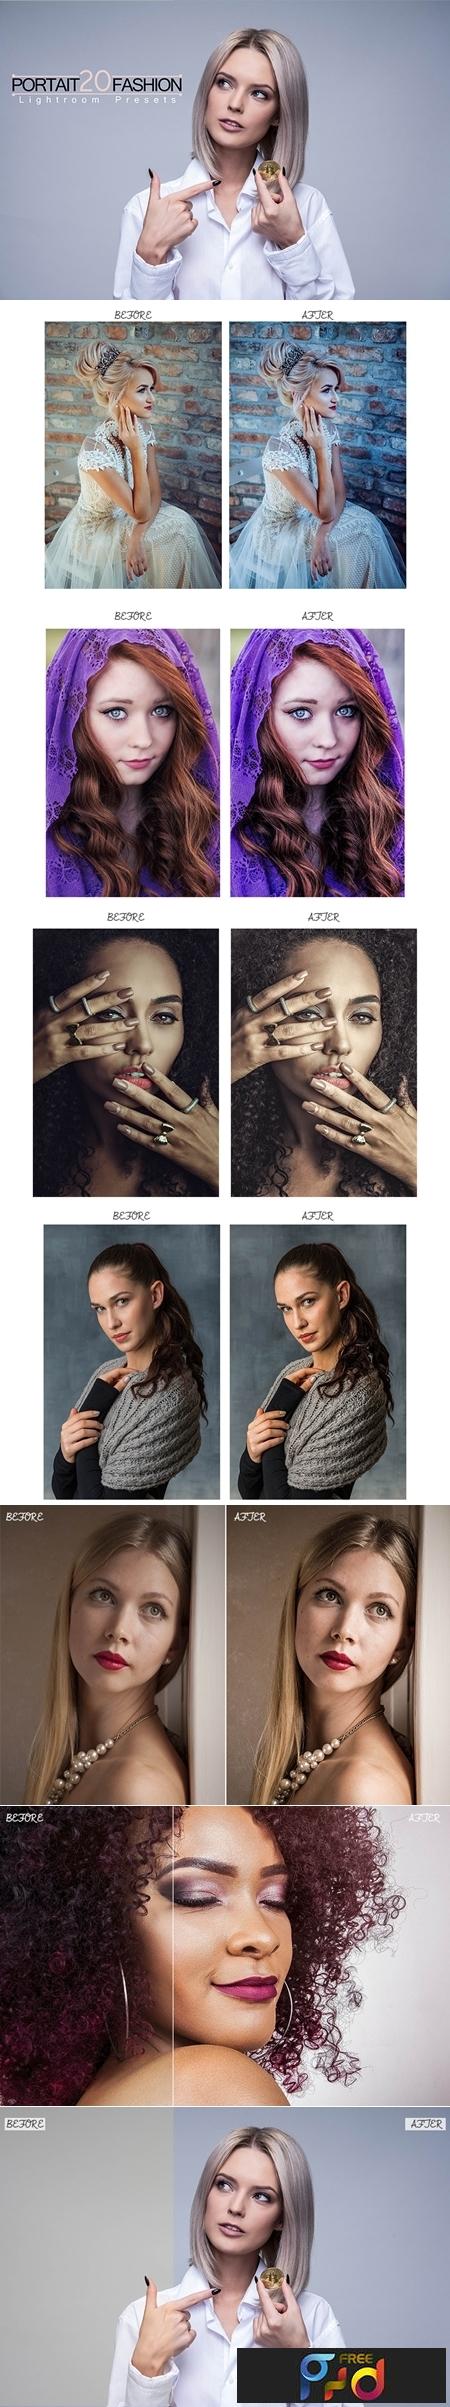 20 Portrait Fashion Lightroom Presets 3544382 1